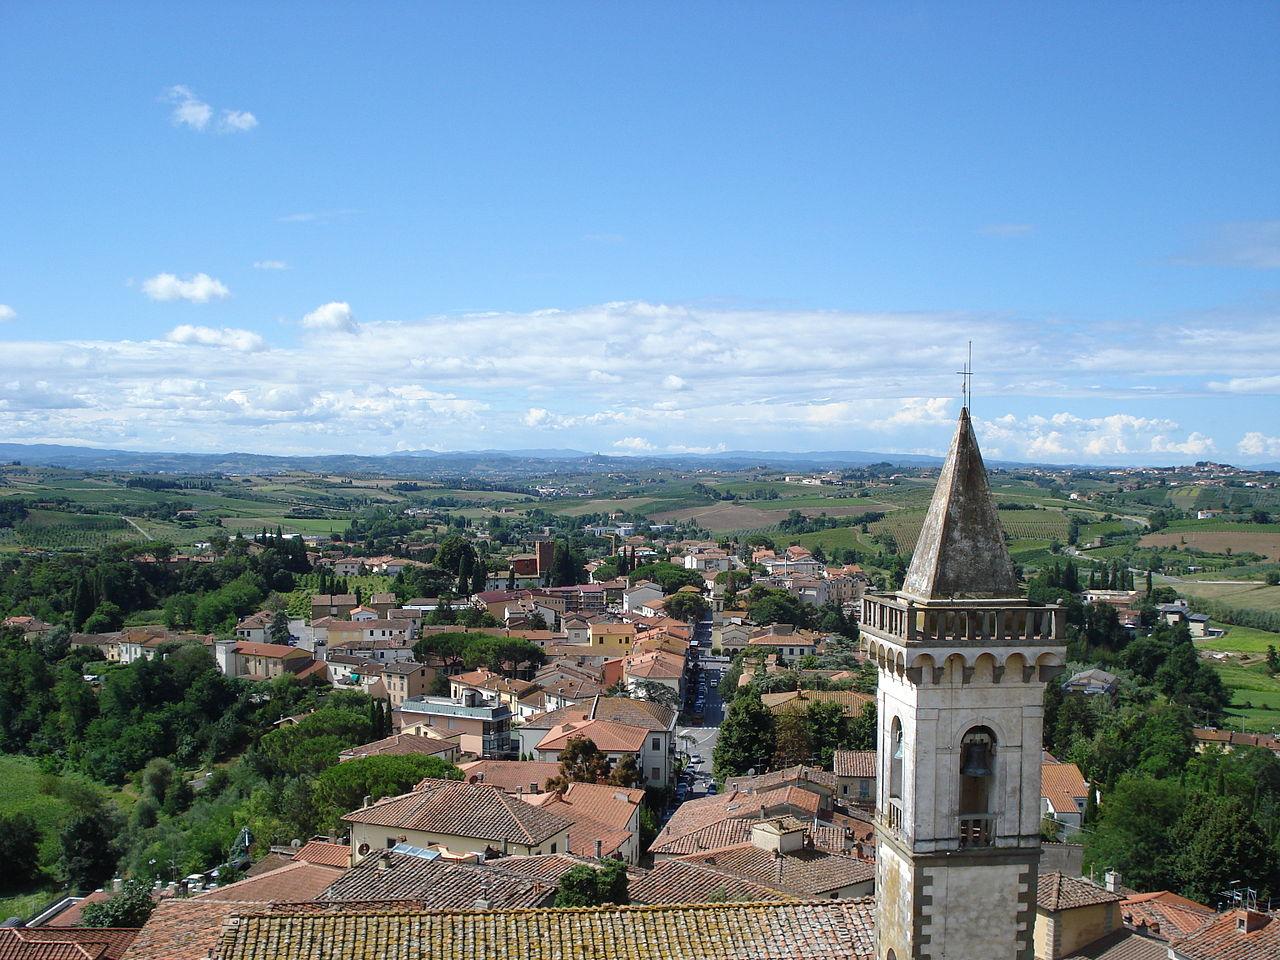 1280px-Vinci,_Tuscany